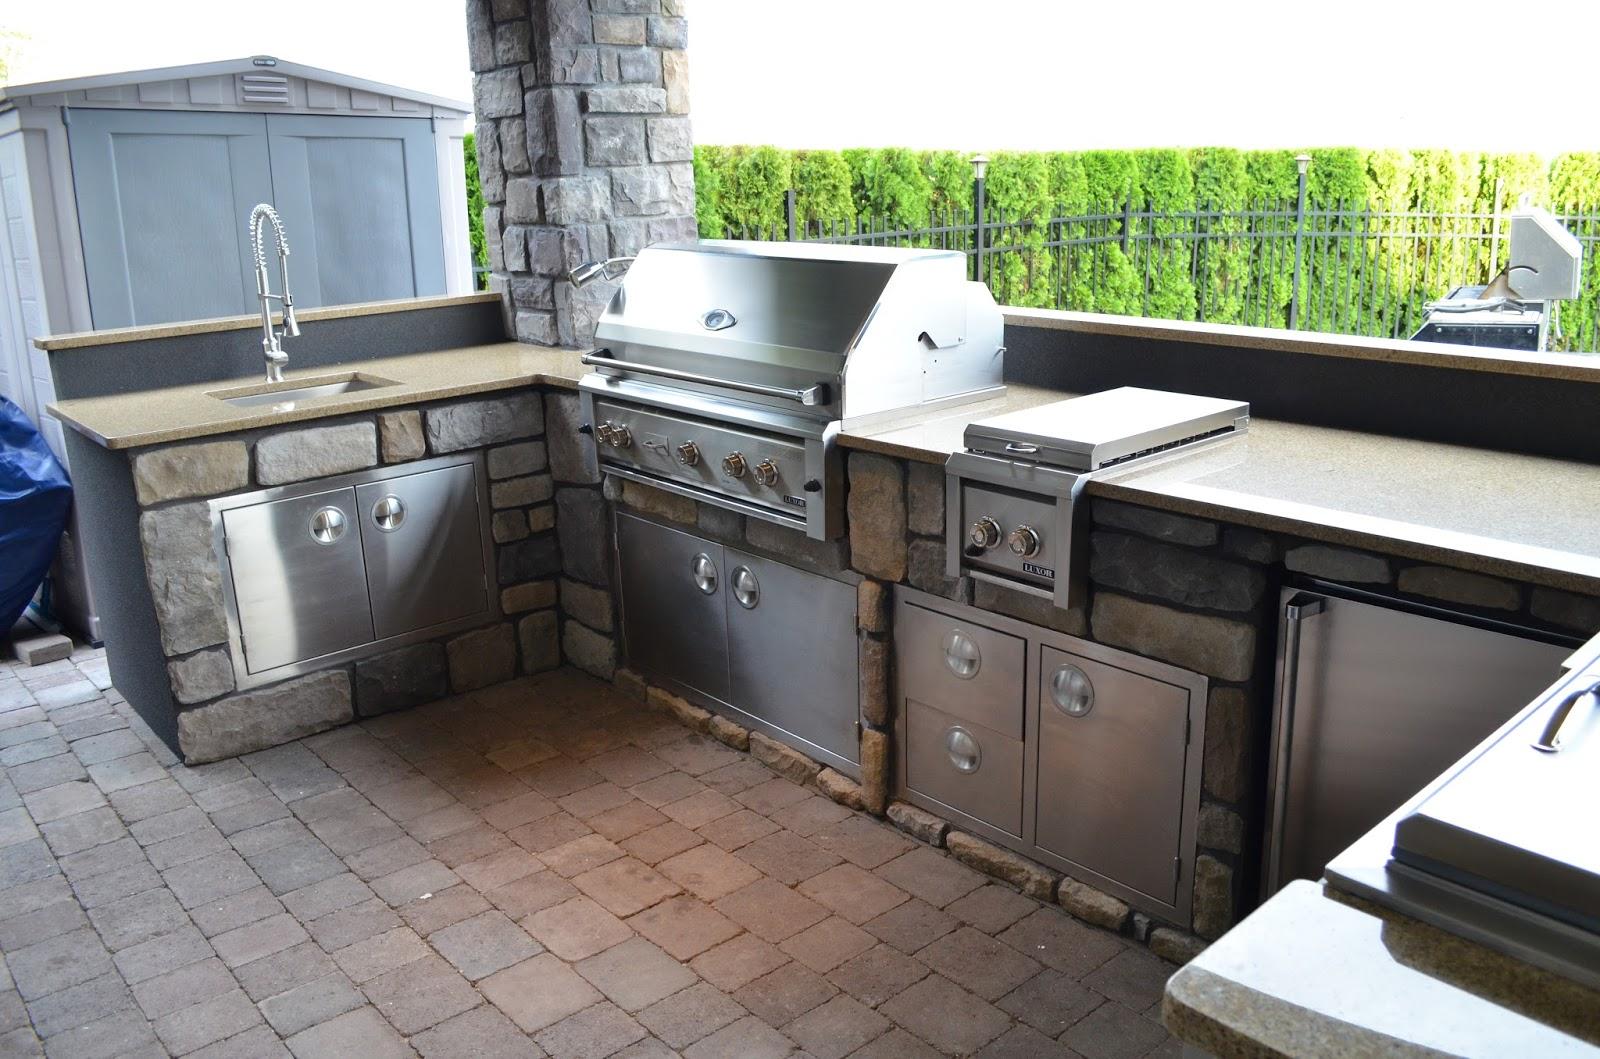 outdoor kitchen ice maker photo - 7